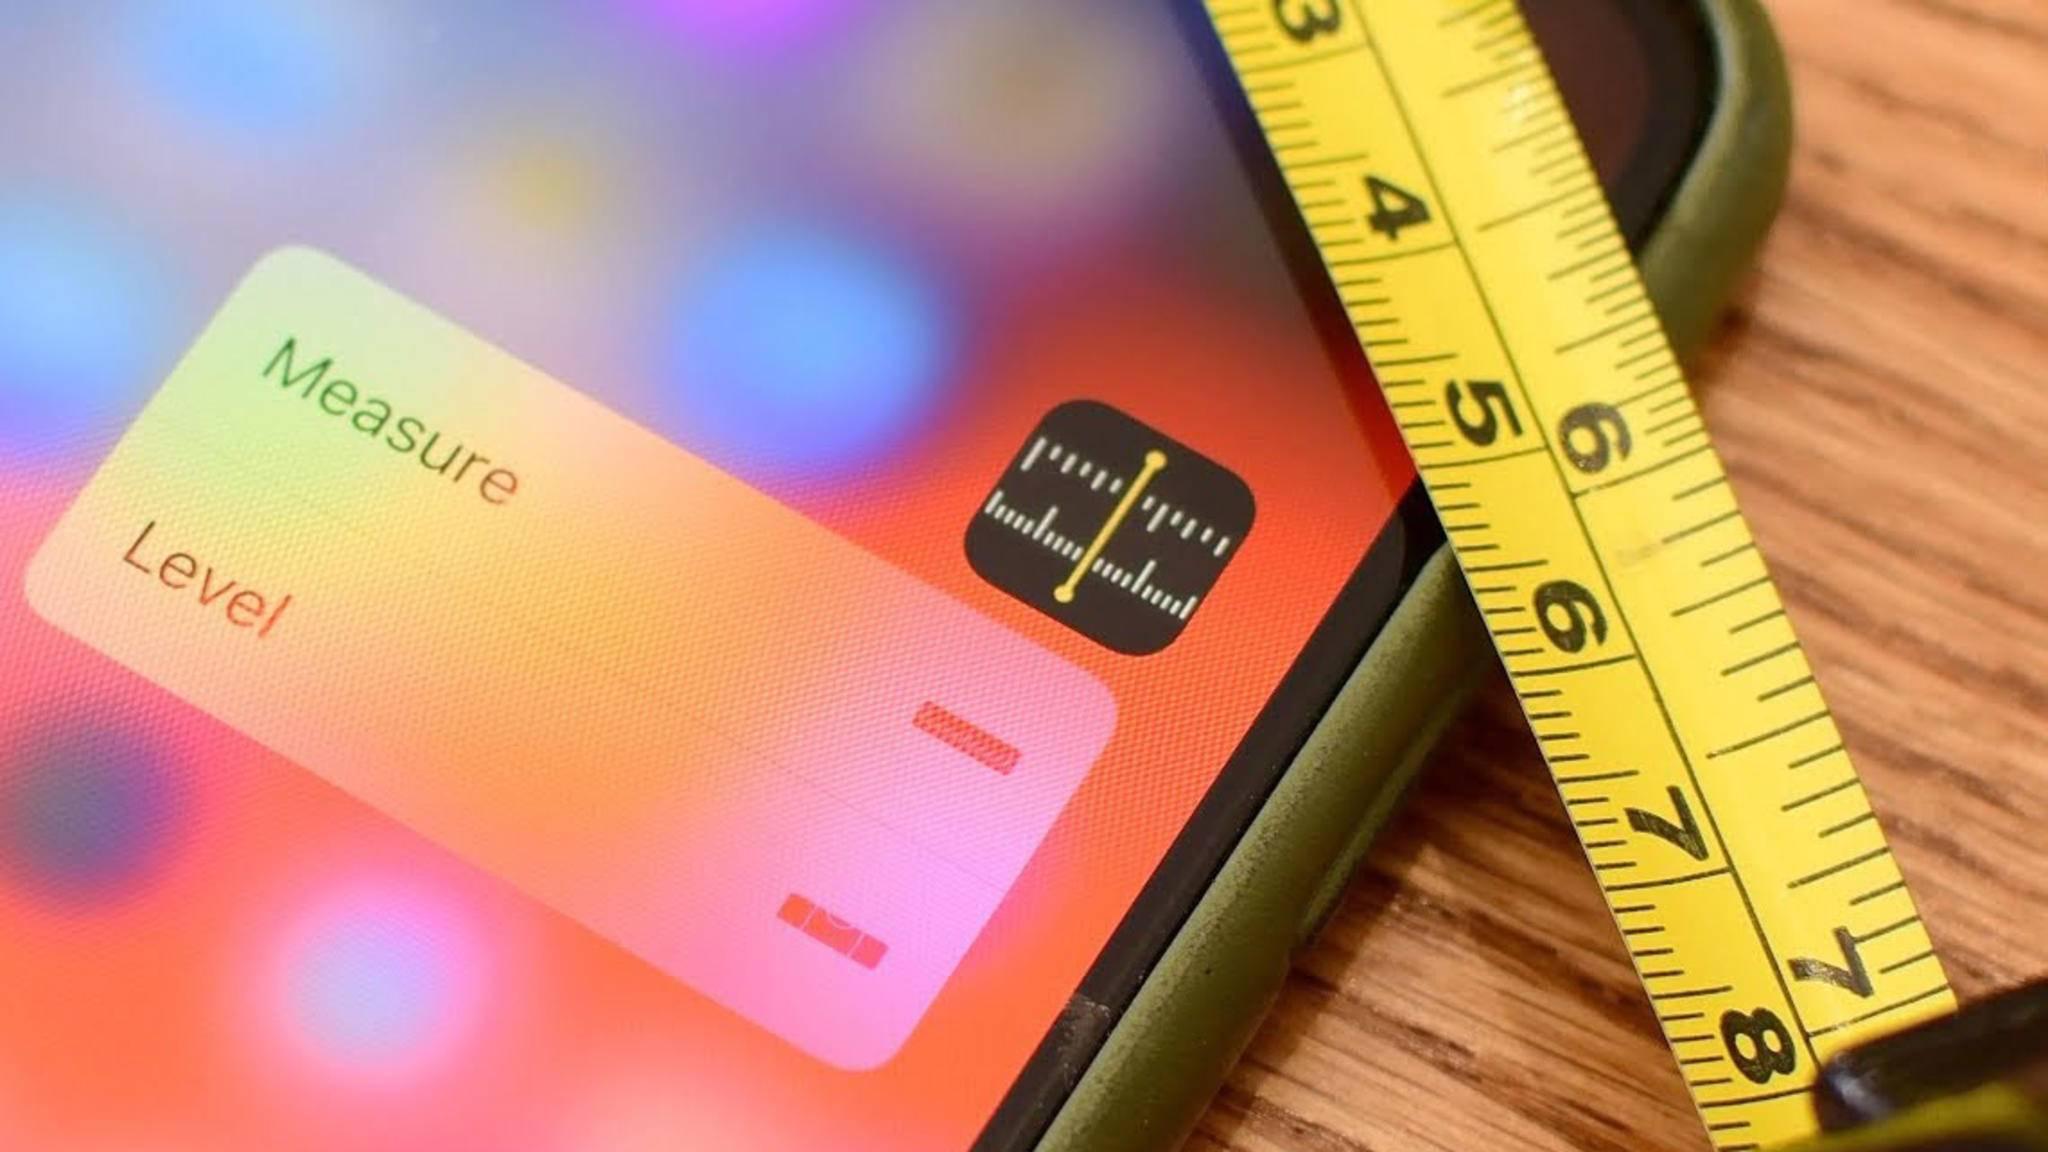 Iphone Entfernungsmesser Preis : So funktioniert die neue maßband app in ios 12